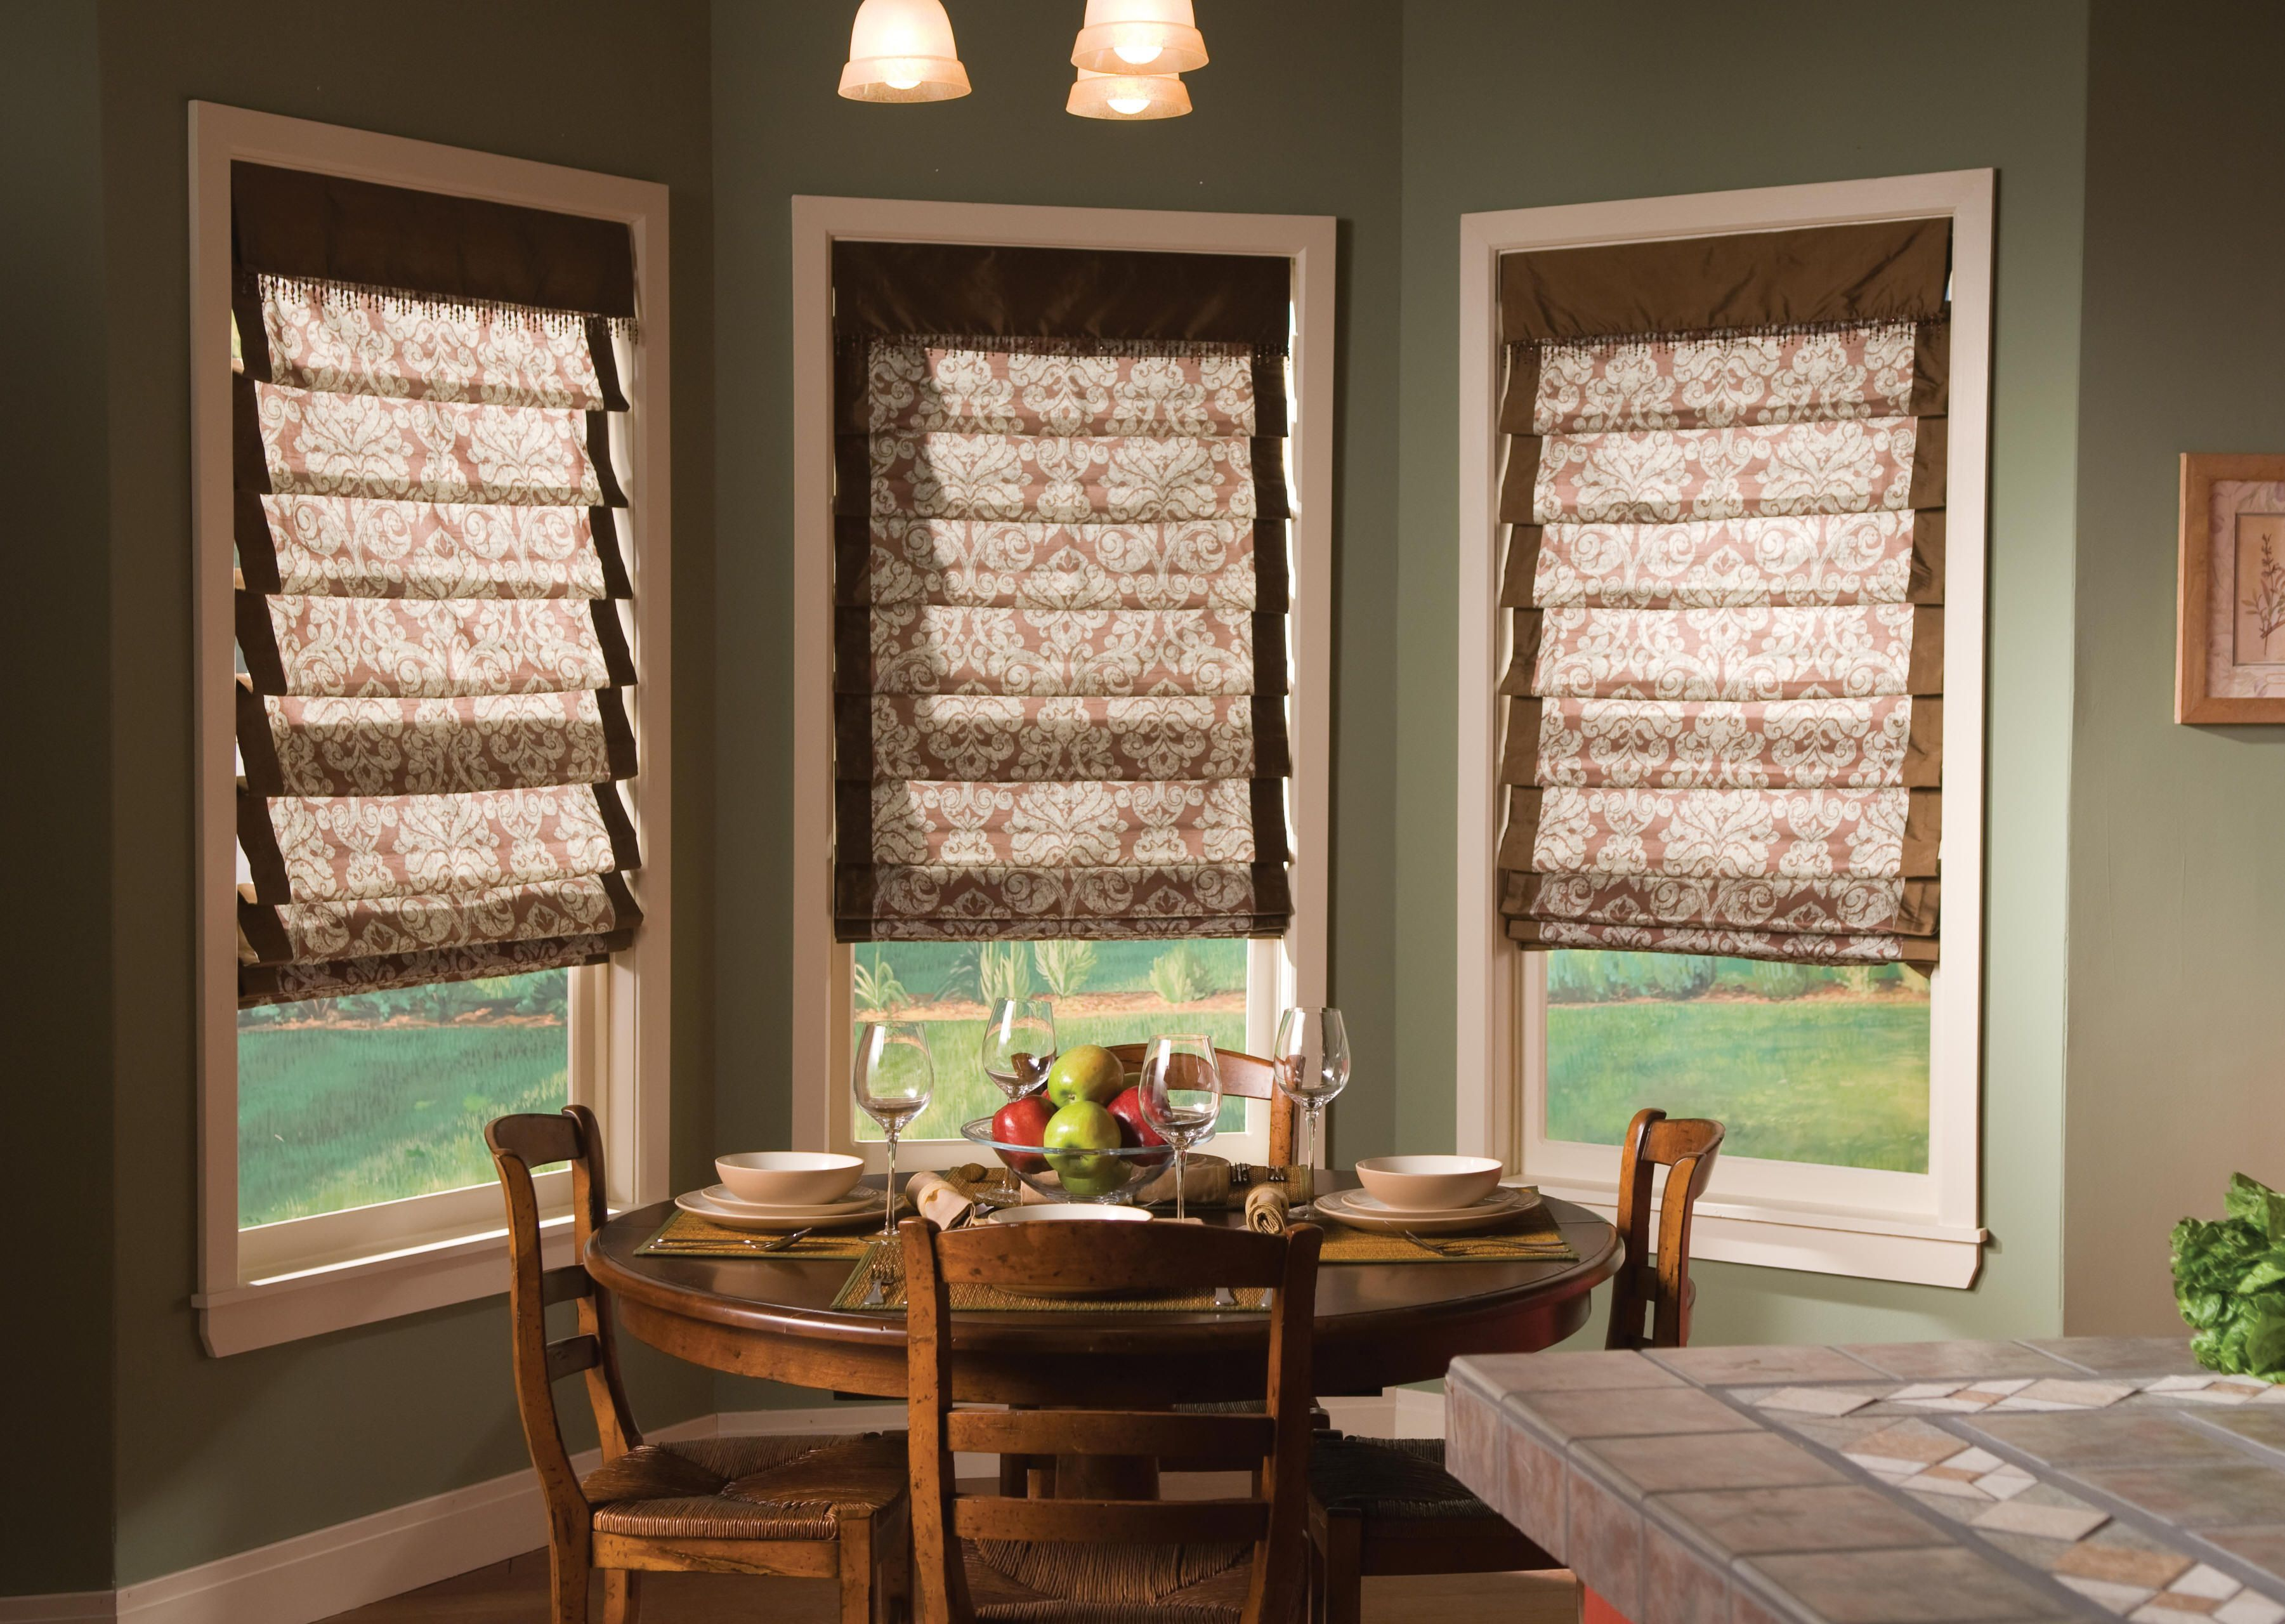 Superieur Kitchen Window Blinds Peculiar Look : Best Blinds For Kitchen Windows. Best  Blinds For Kitchen Windows. More Window Treatments Ideas